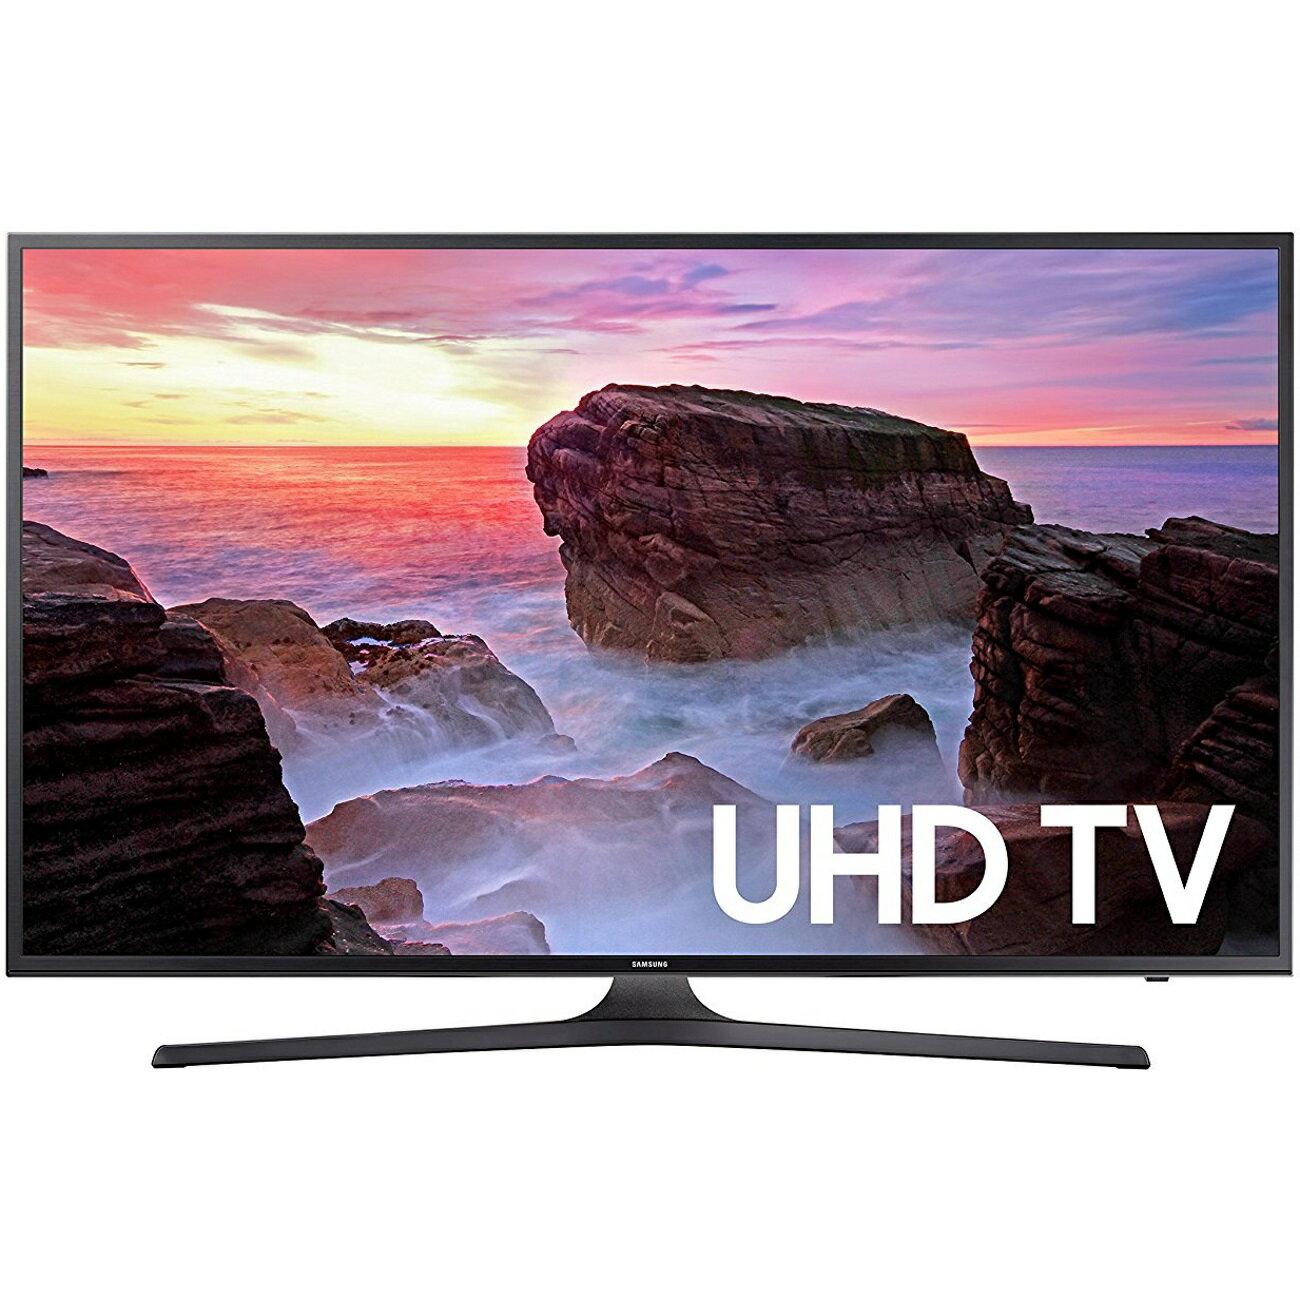 "Samsung UN65MU6300FXZA 65"" 4K HDR Ultra HD Smart LED TV (2017 Model) 0"